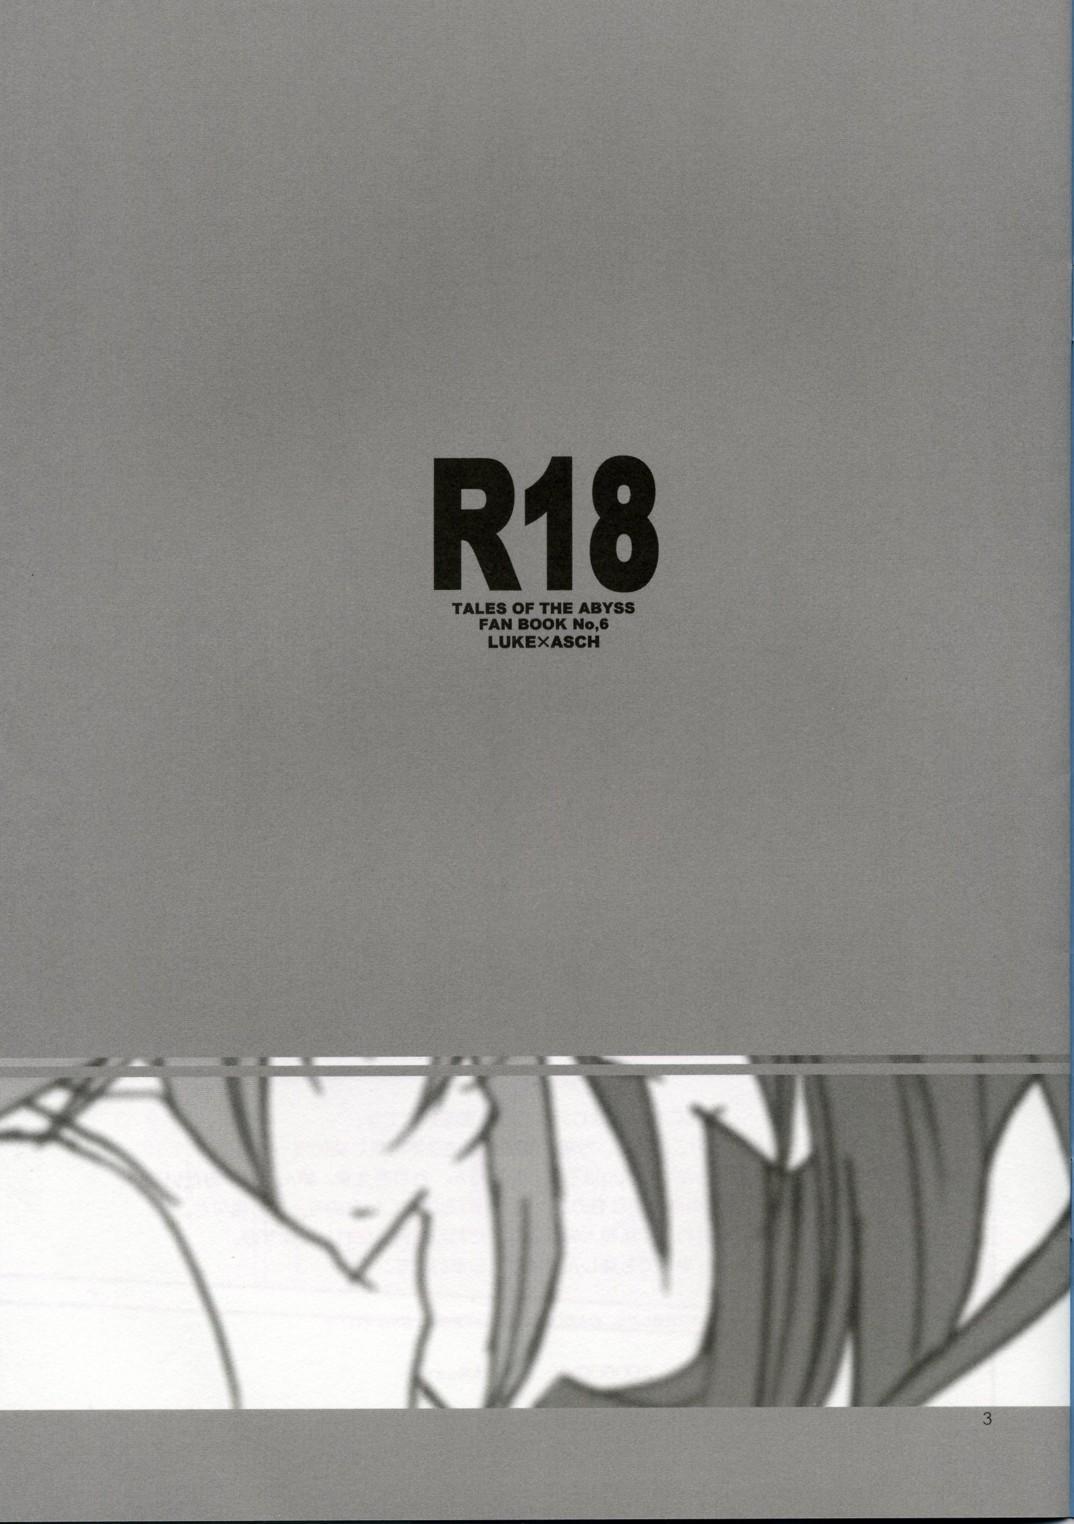 R18 1